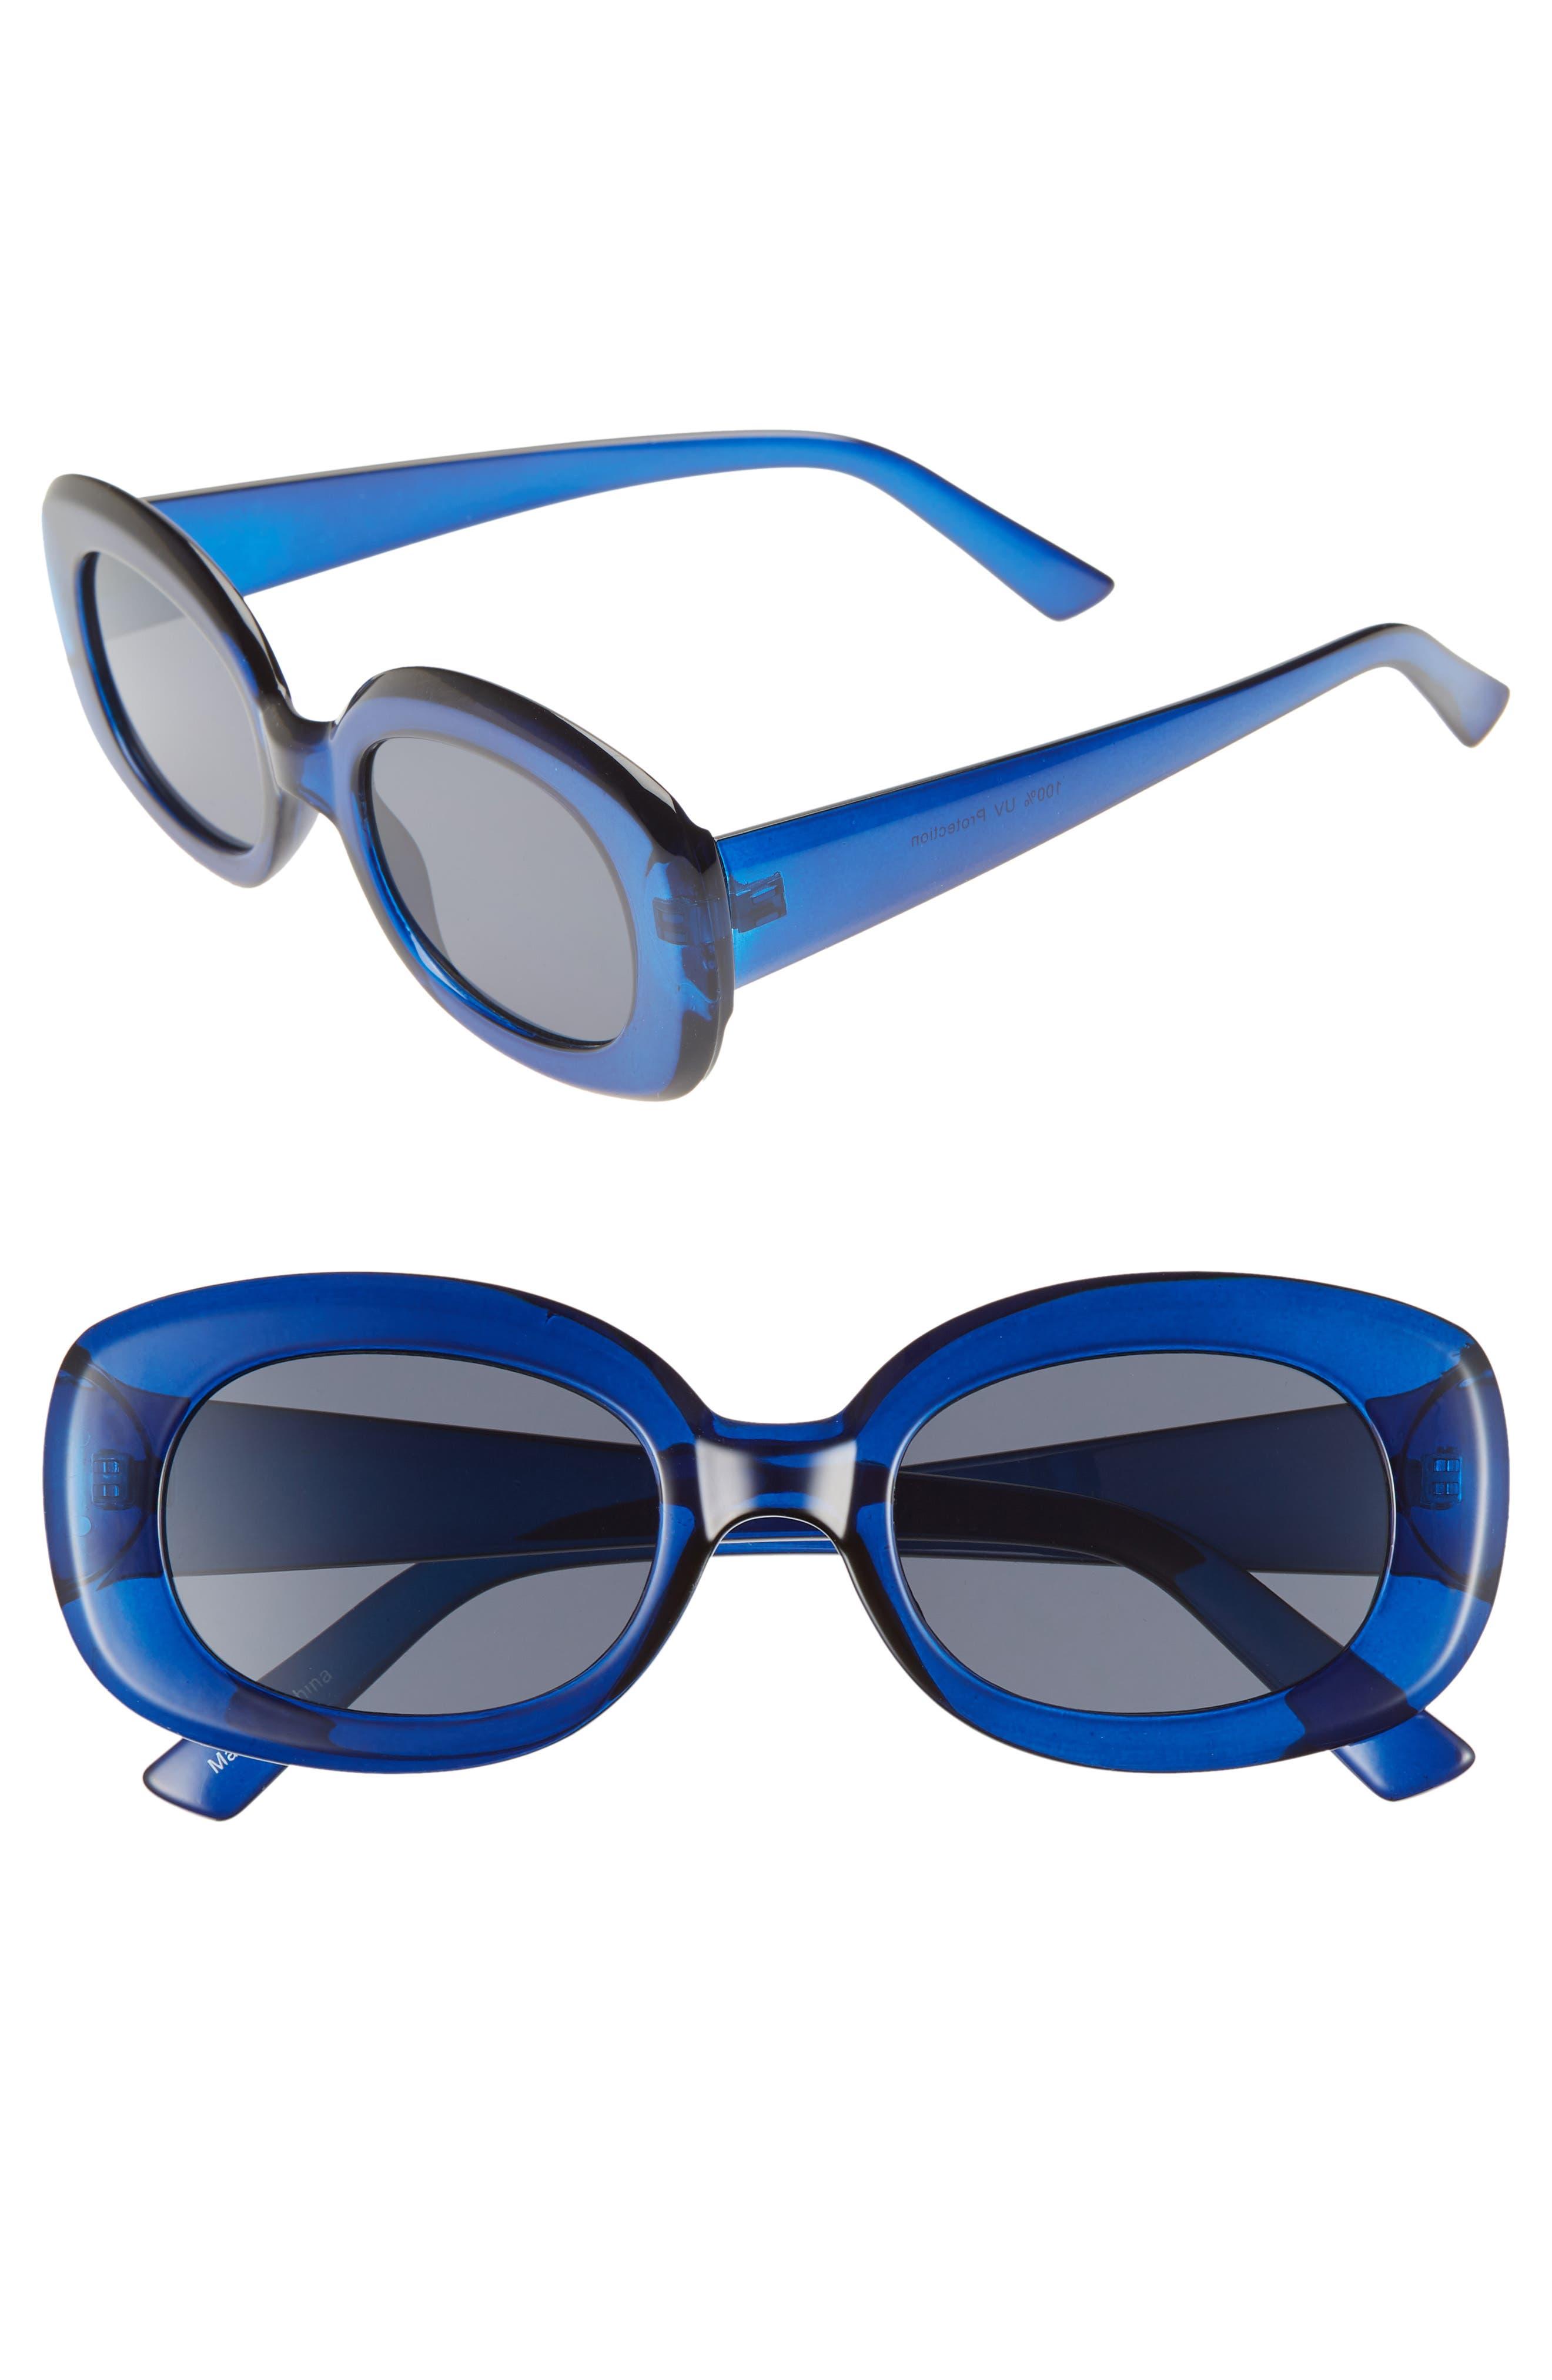 66mm Oval Sunglasses,                             Main thumbnail 1, color,                             BLUE/ BLACK